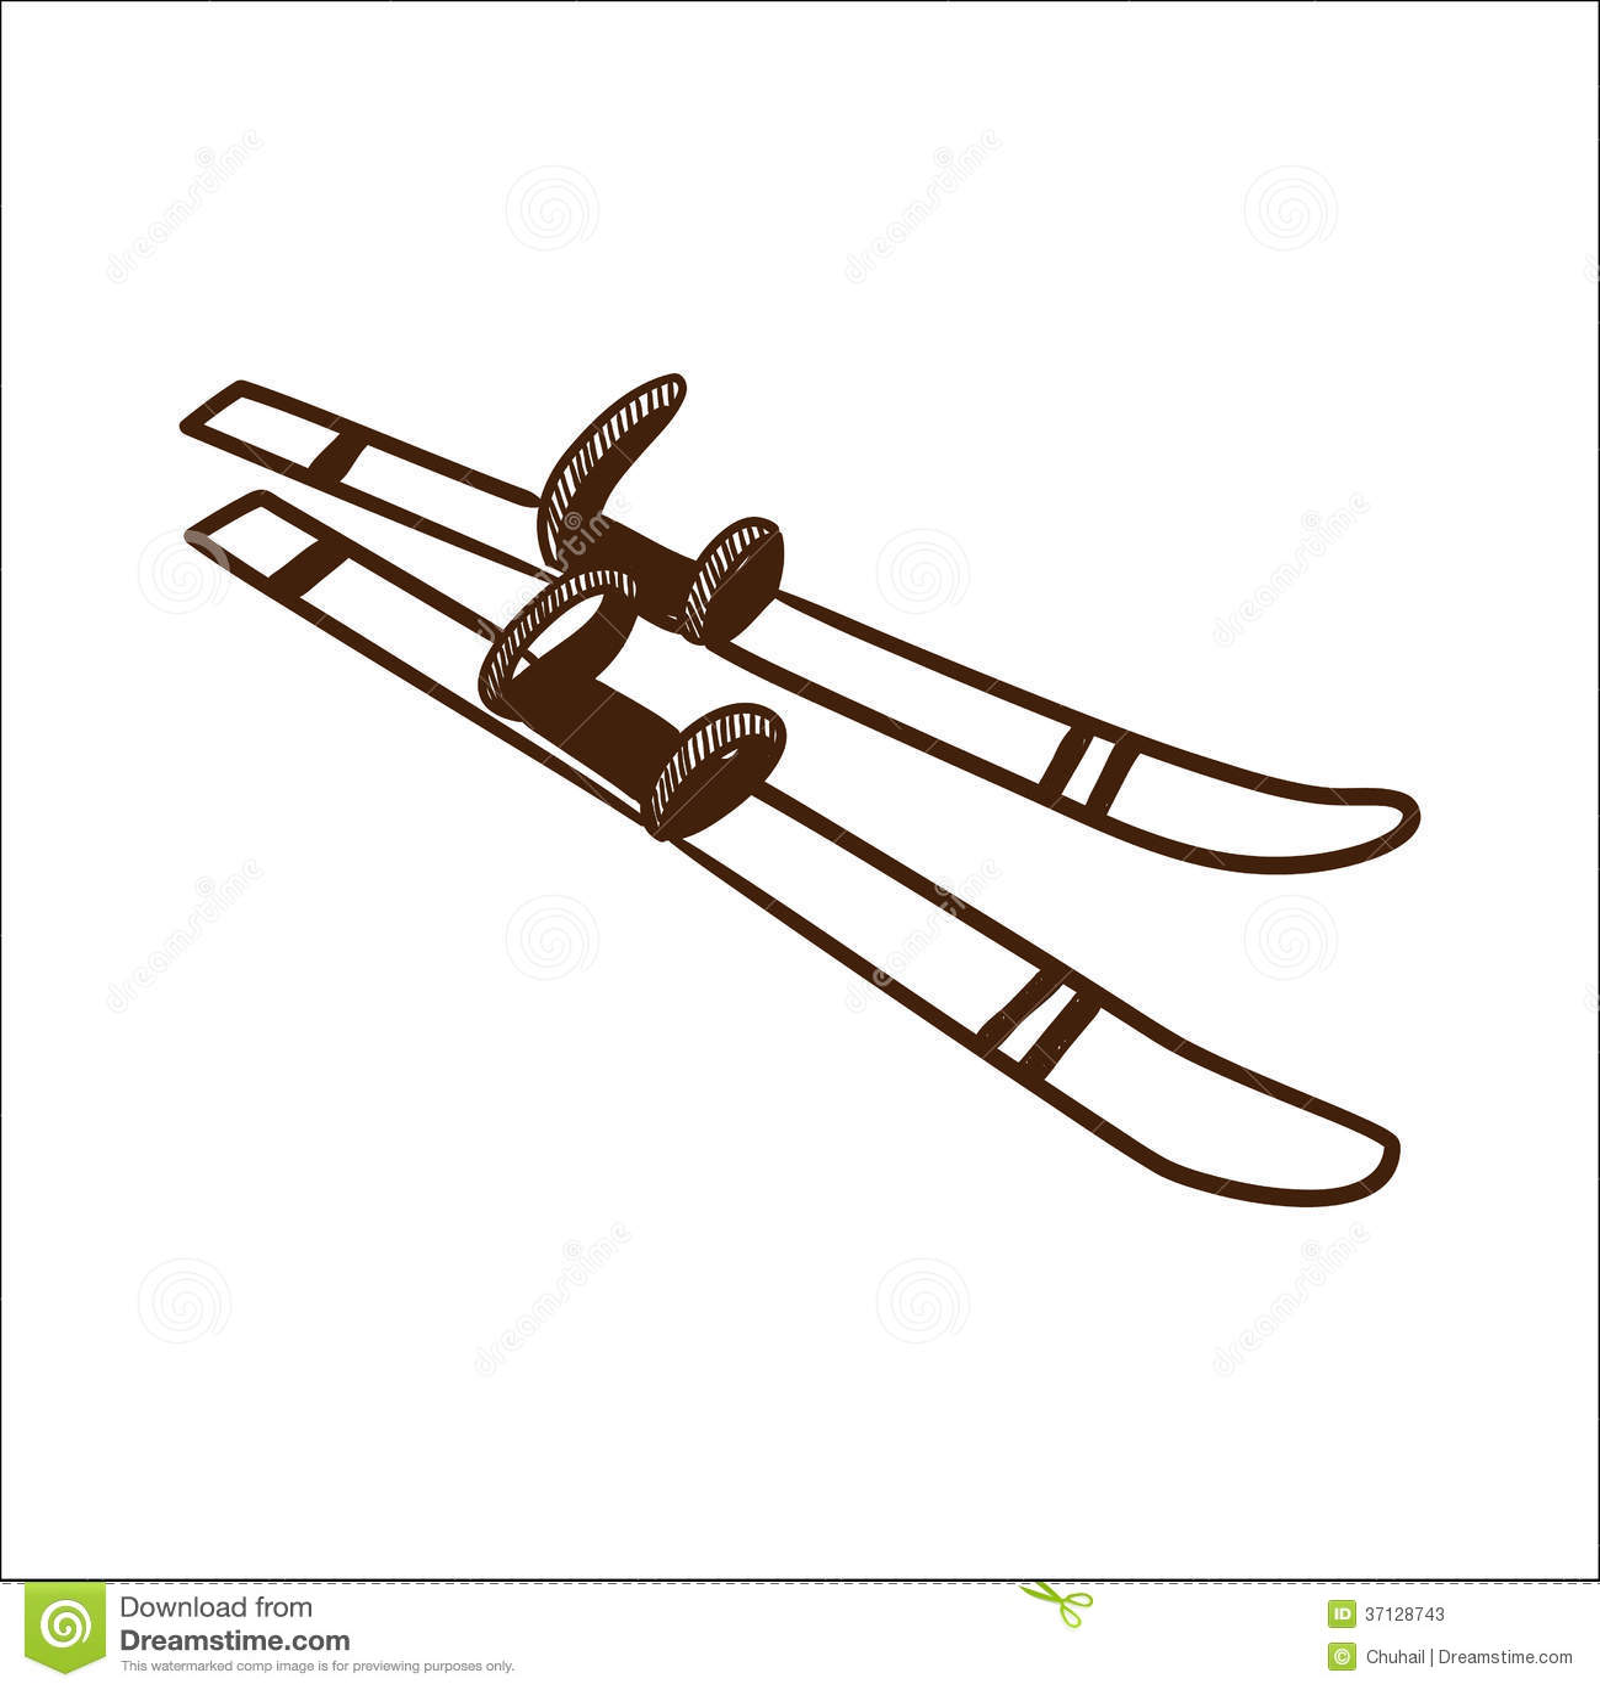 ski equipment stock vector. illustration of jumping, downhill - 37128743